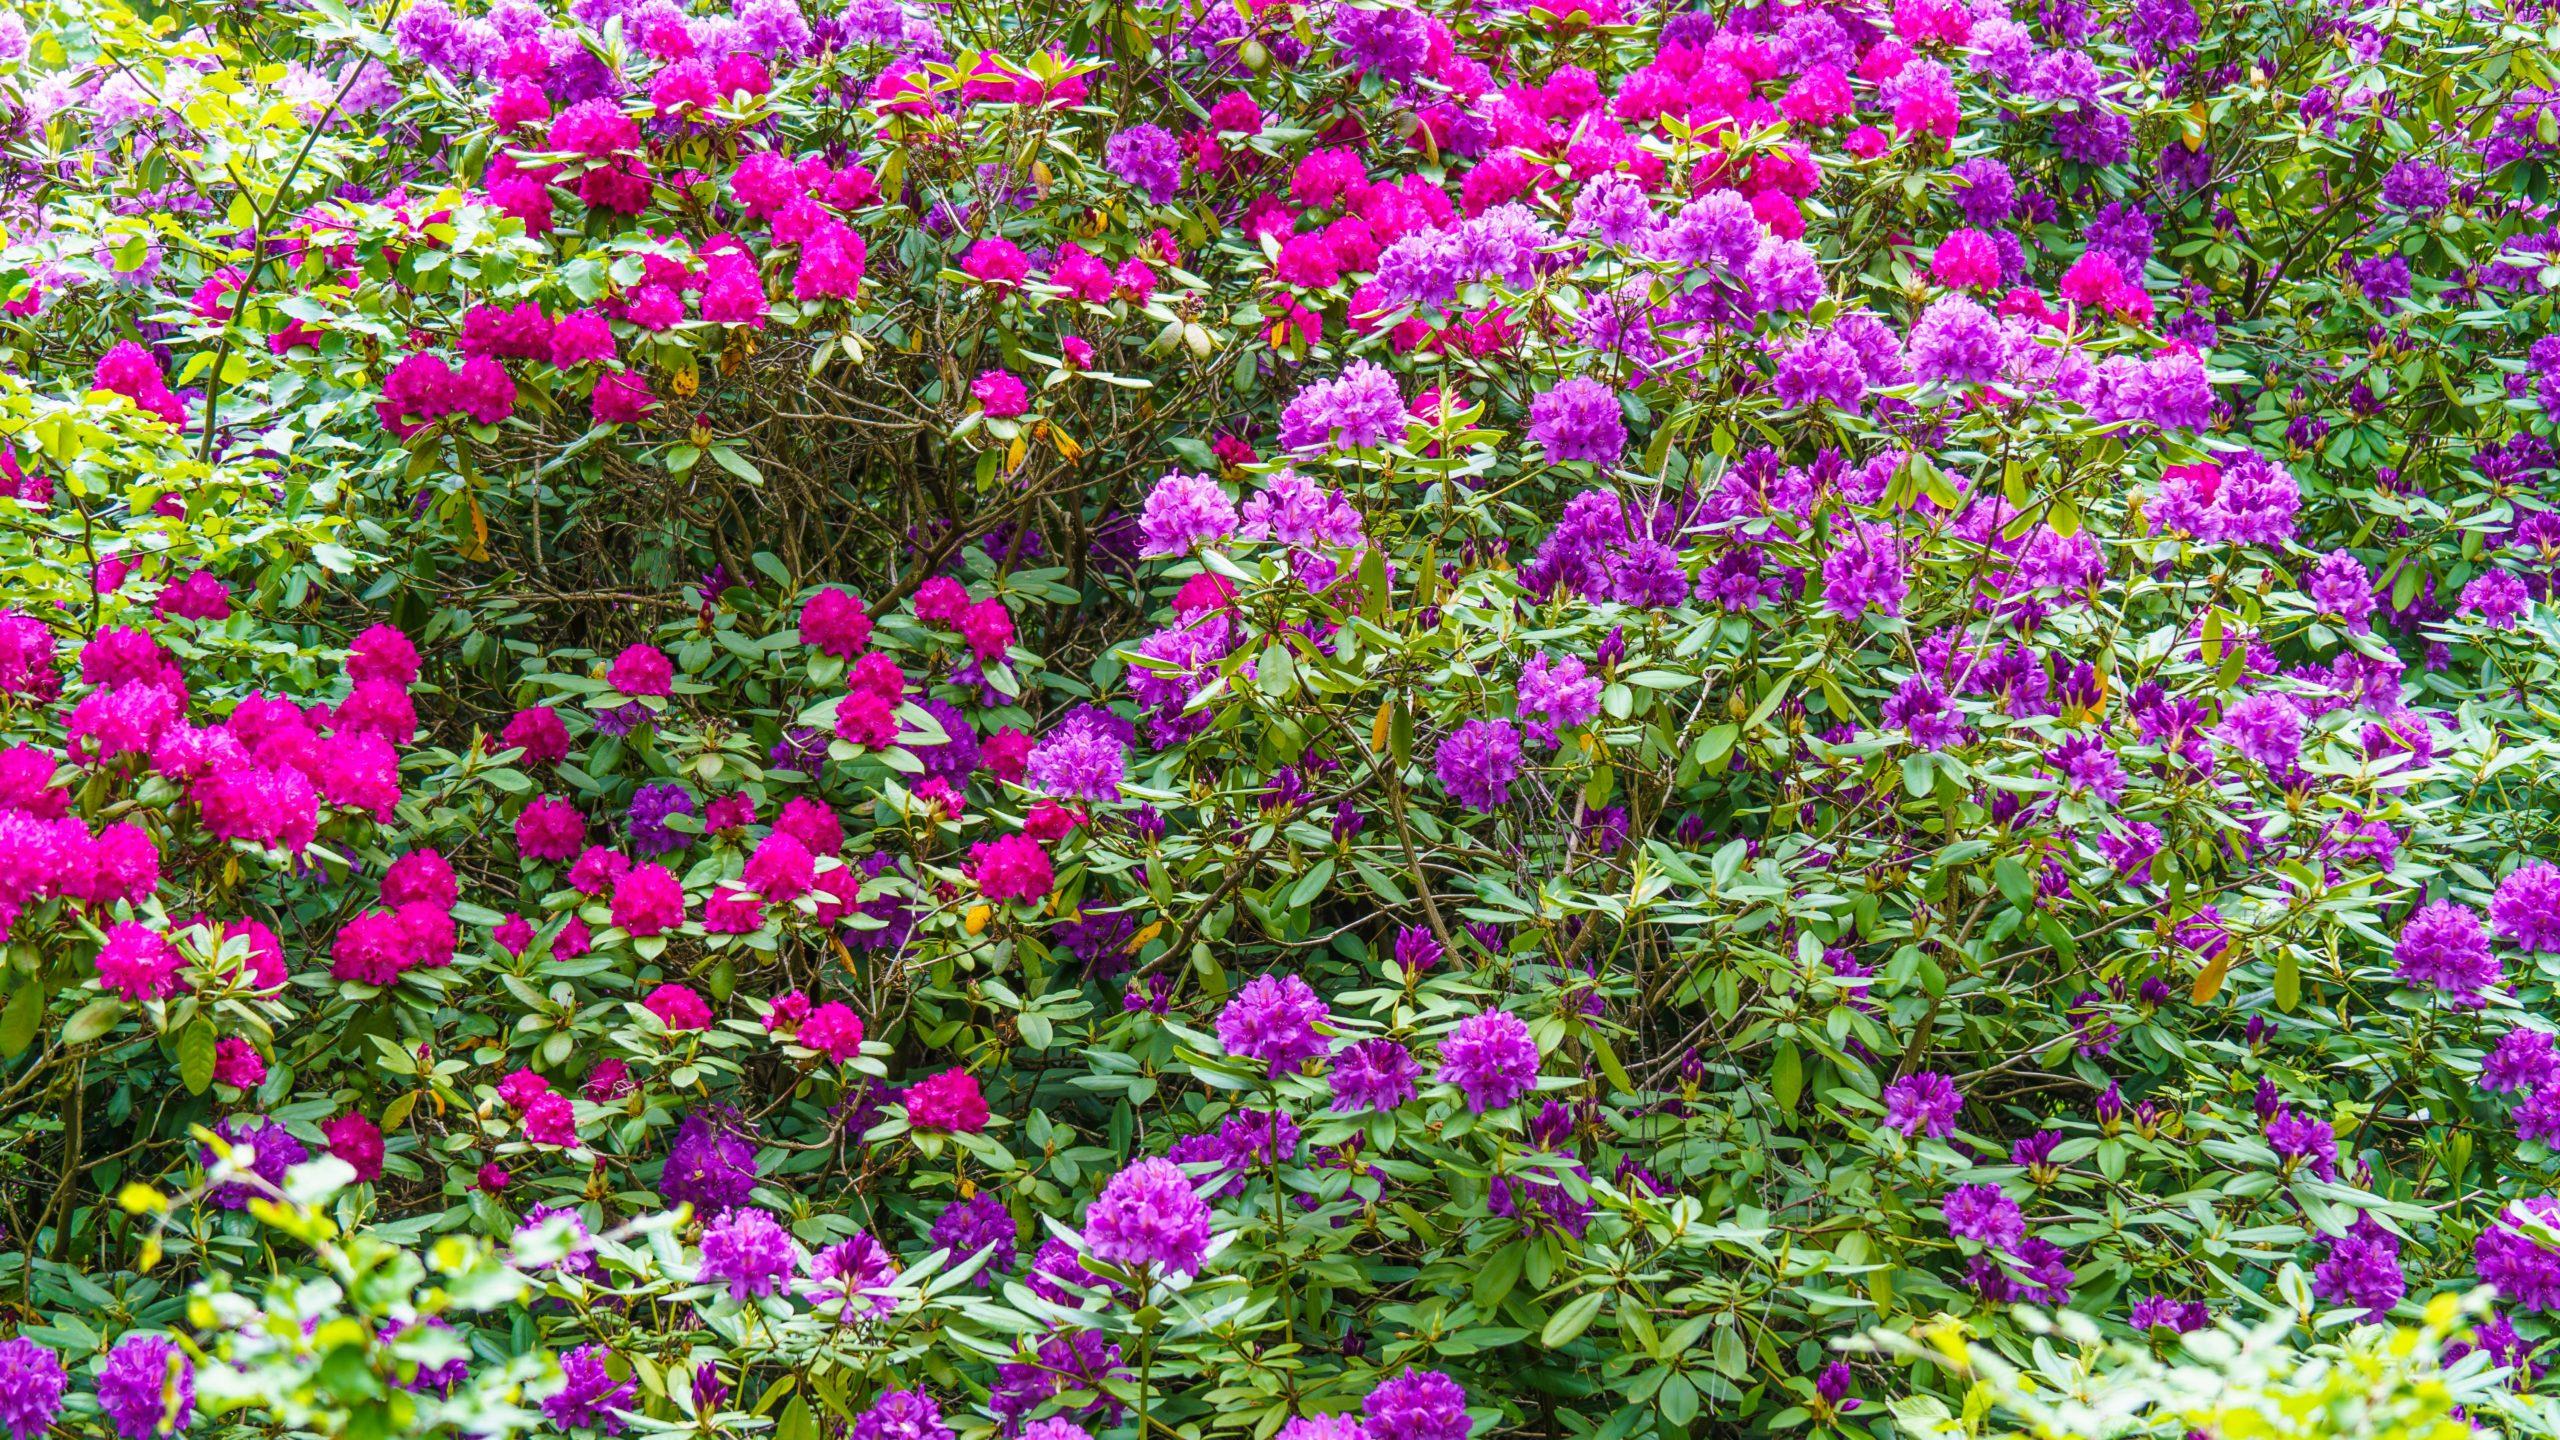 Grenzweg Gerstunger Forst, Rhododendron-Pflanze an der Erbbegräbnis-Stätte nahe Grenzweg